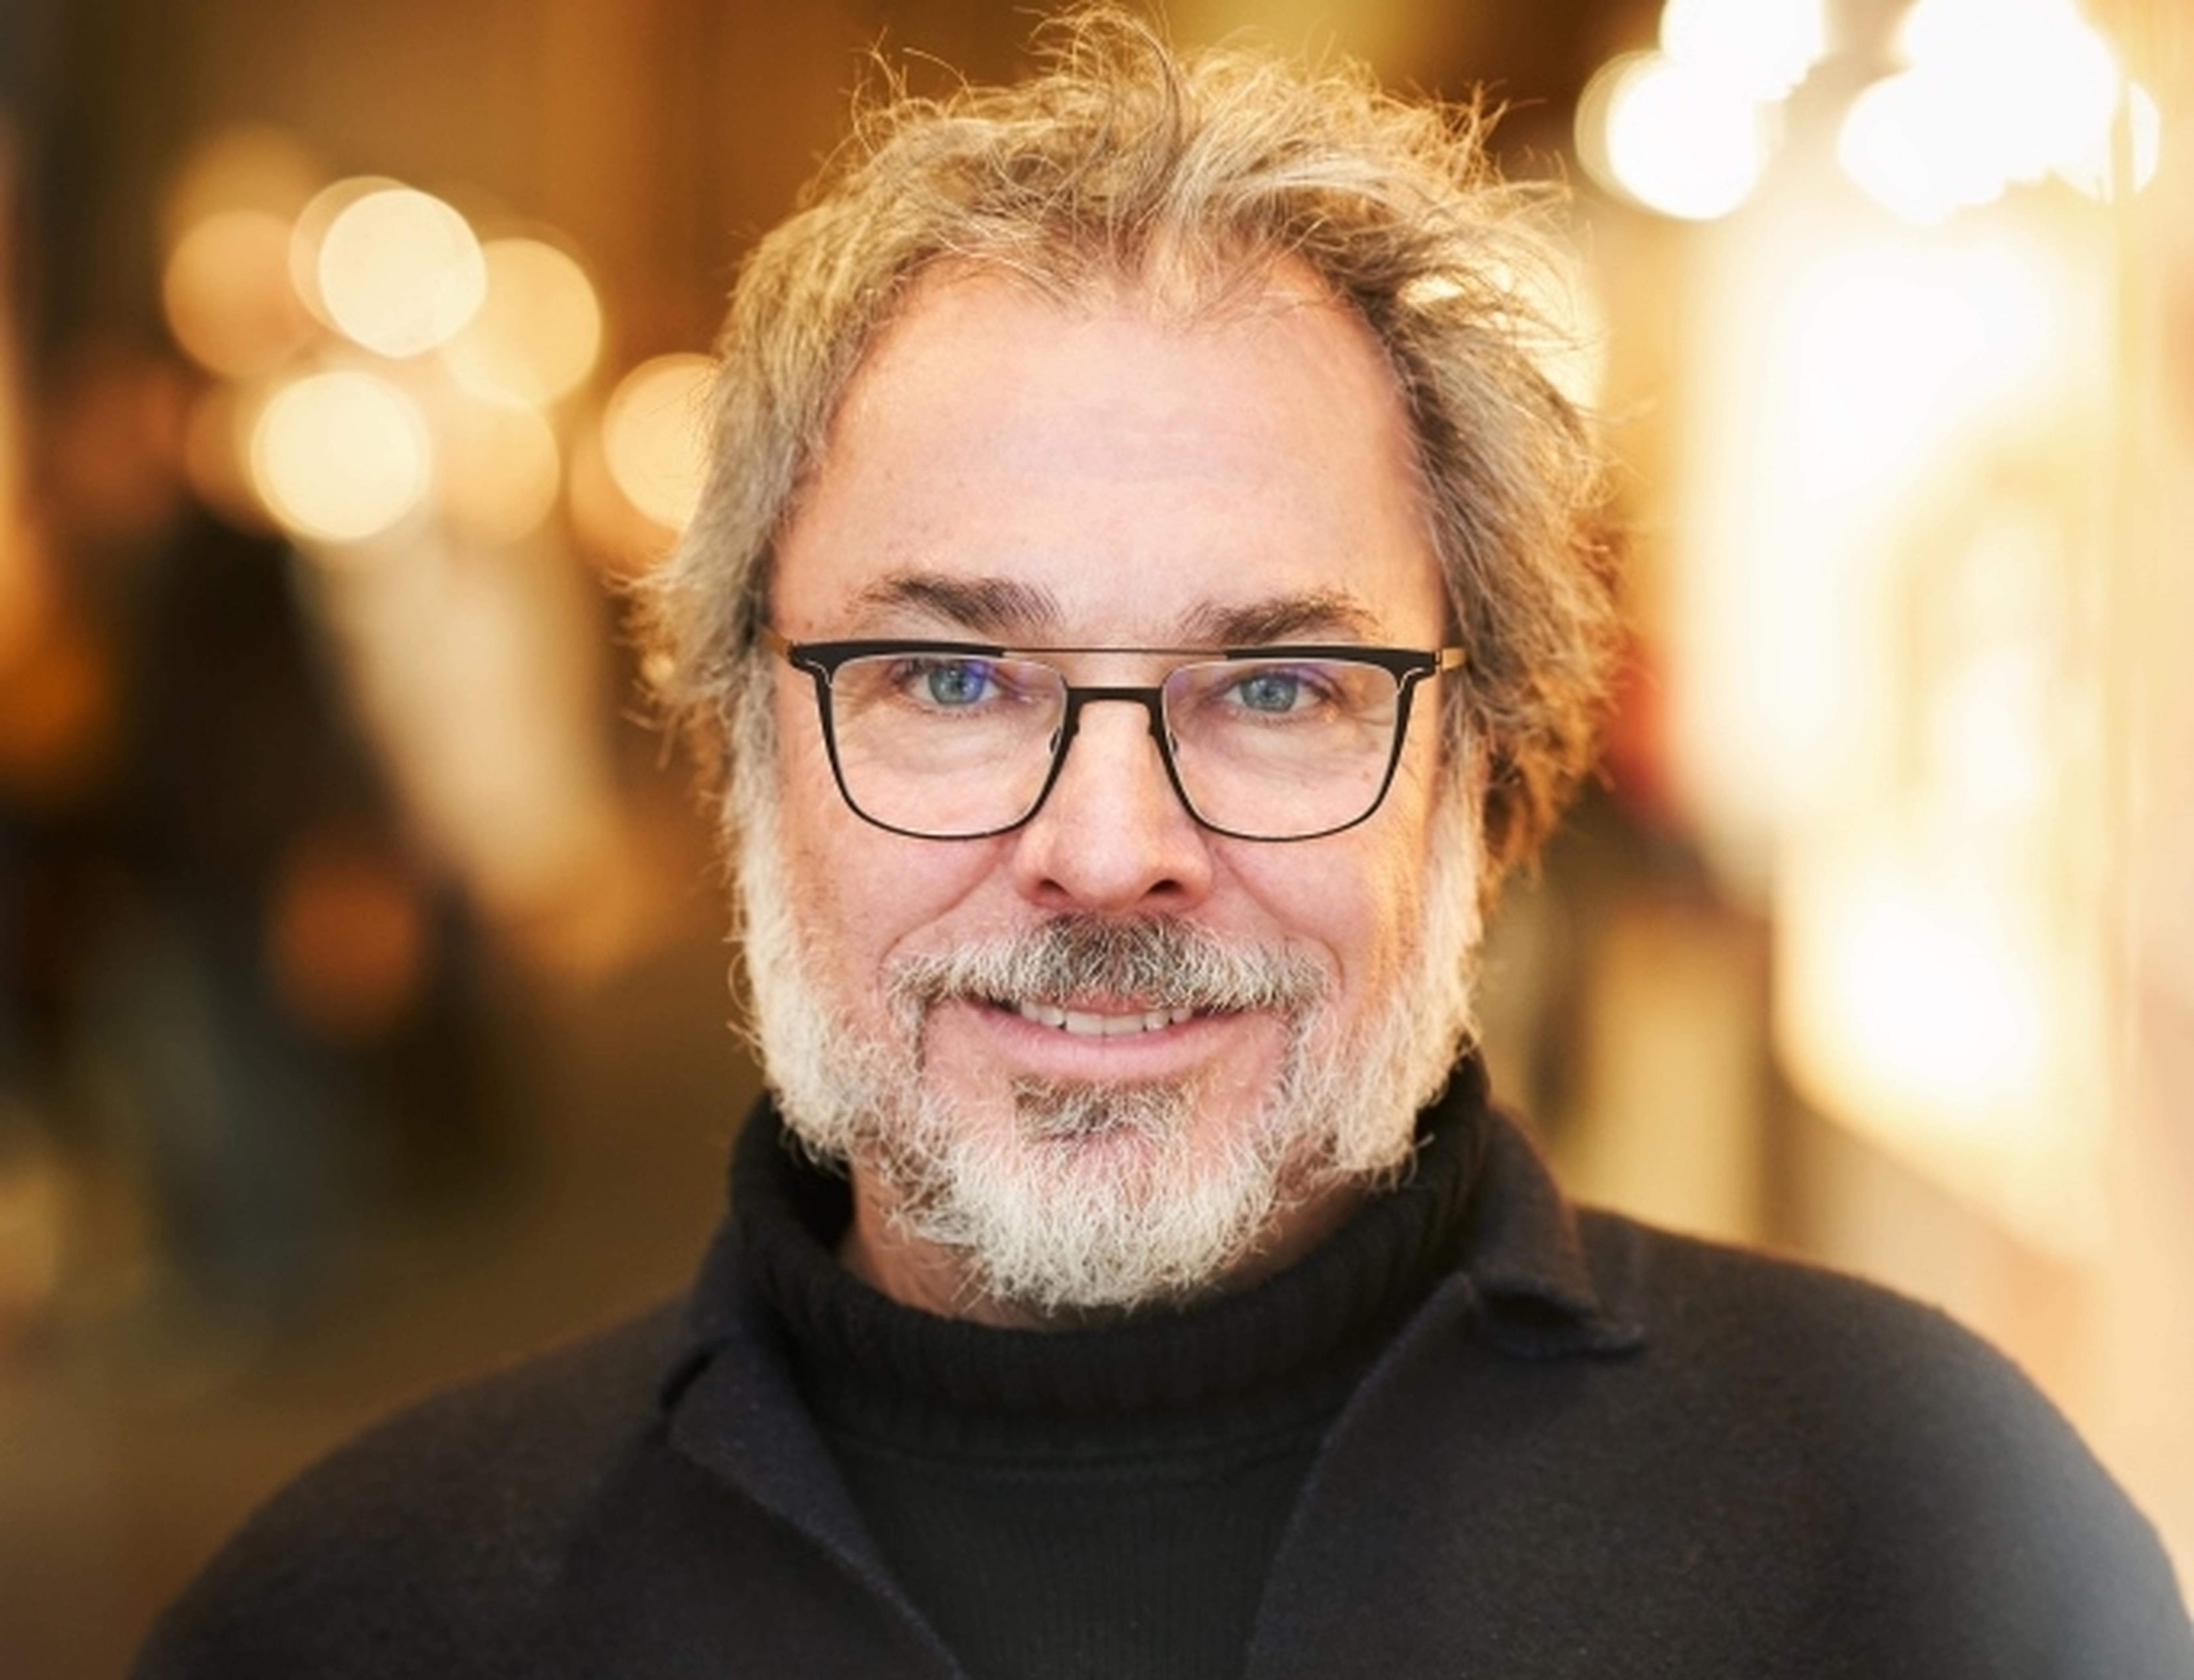 Christian Bégin